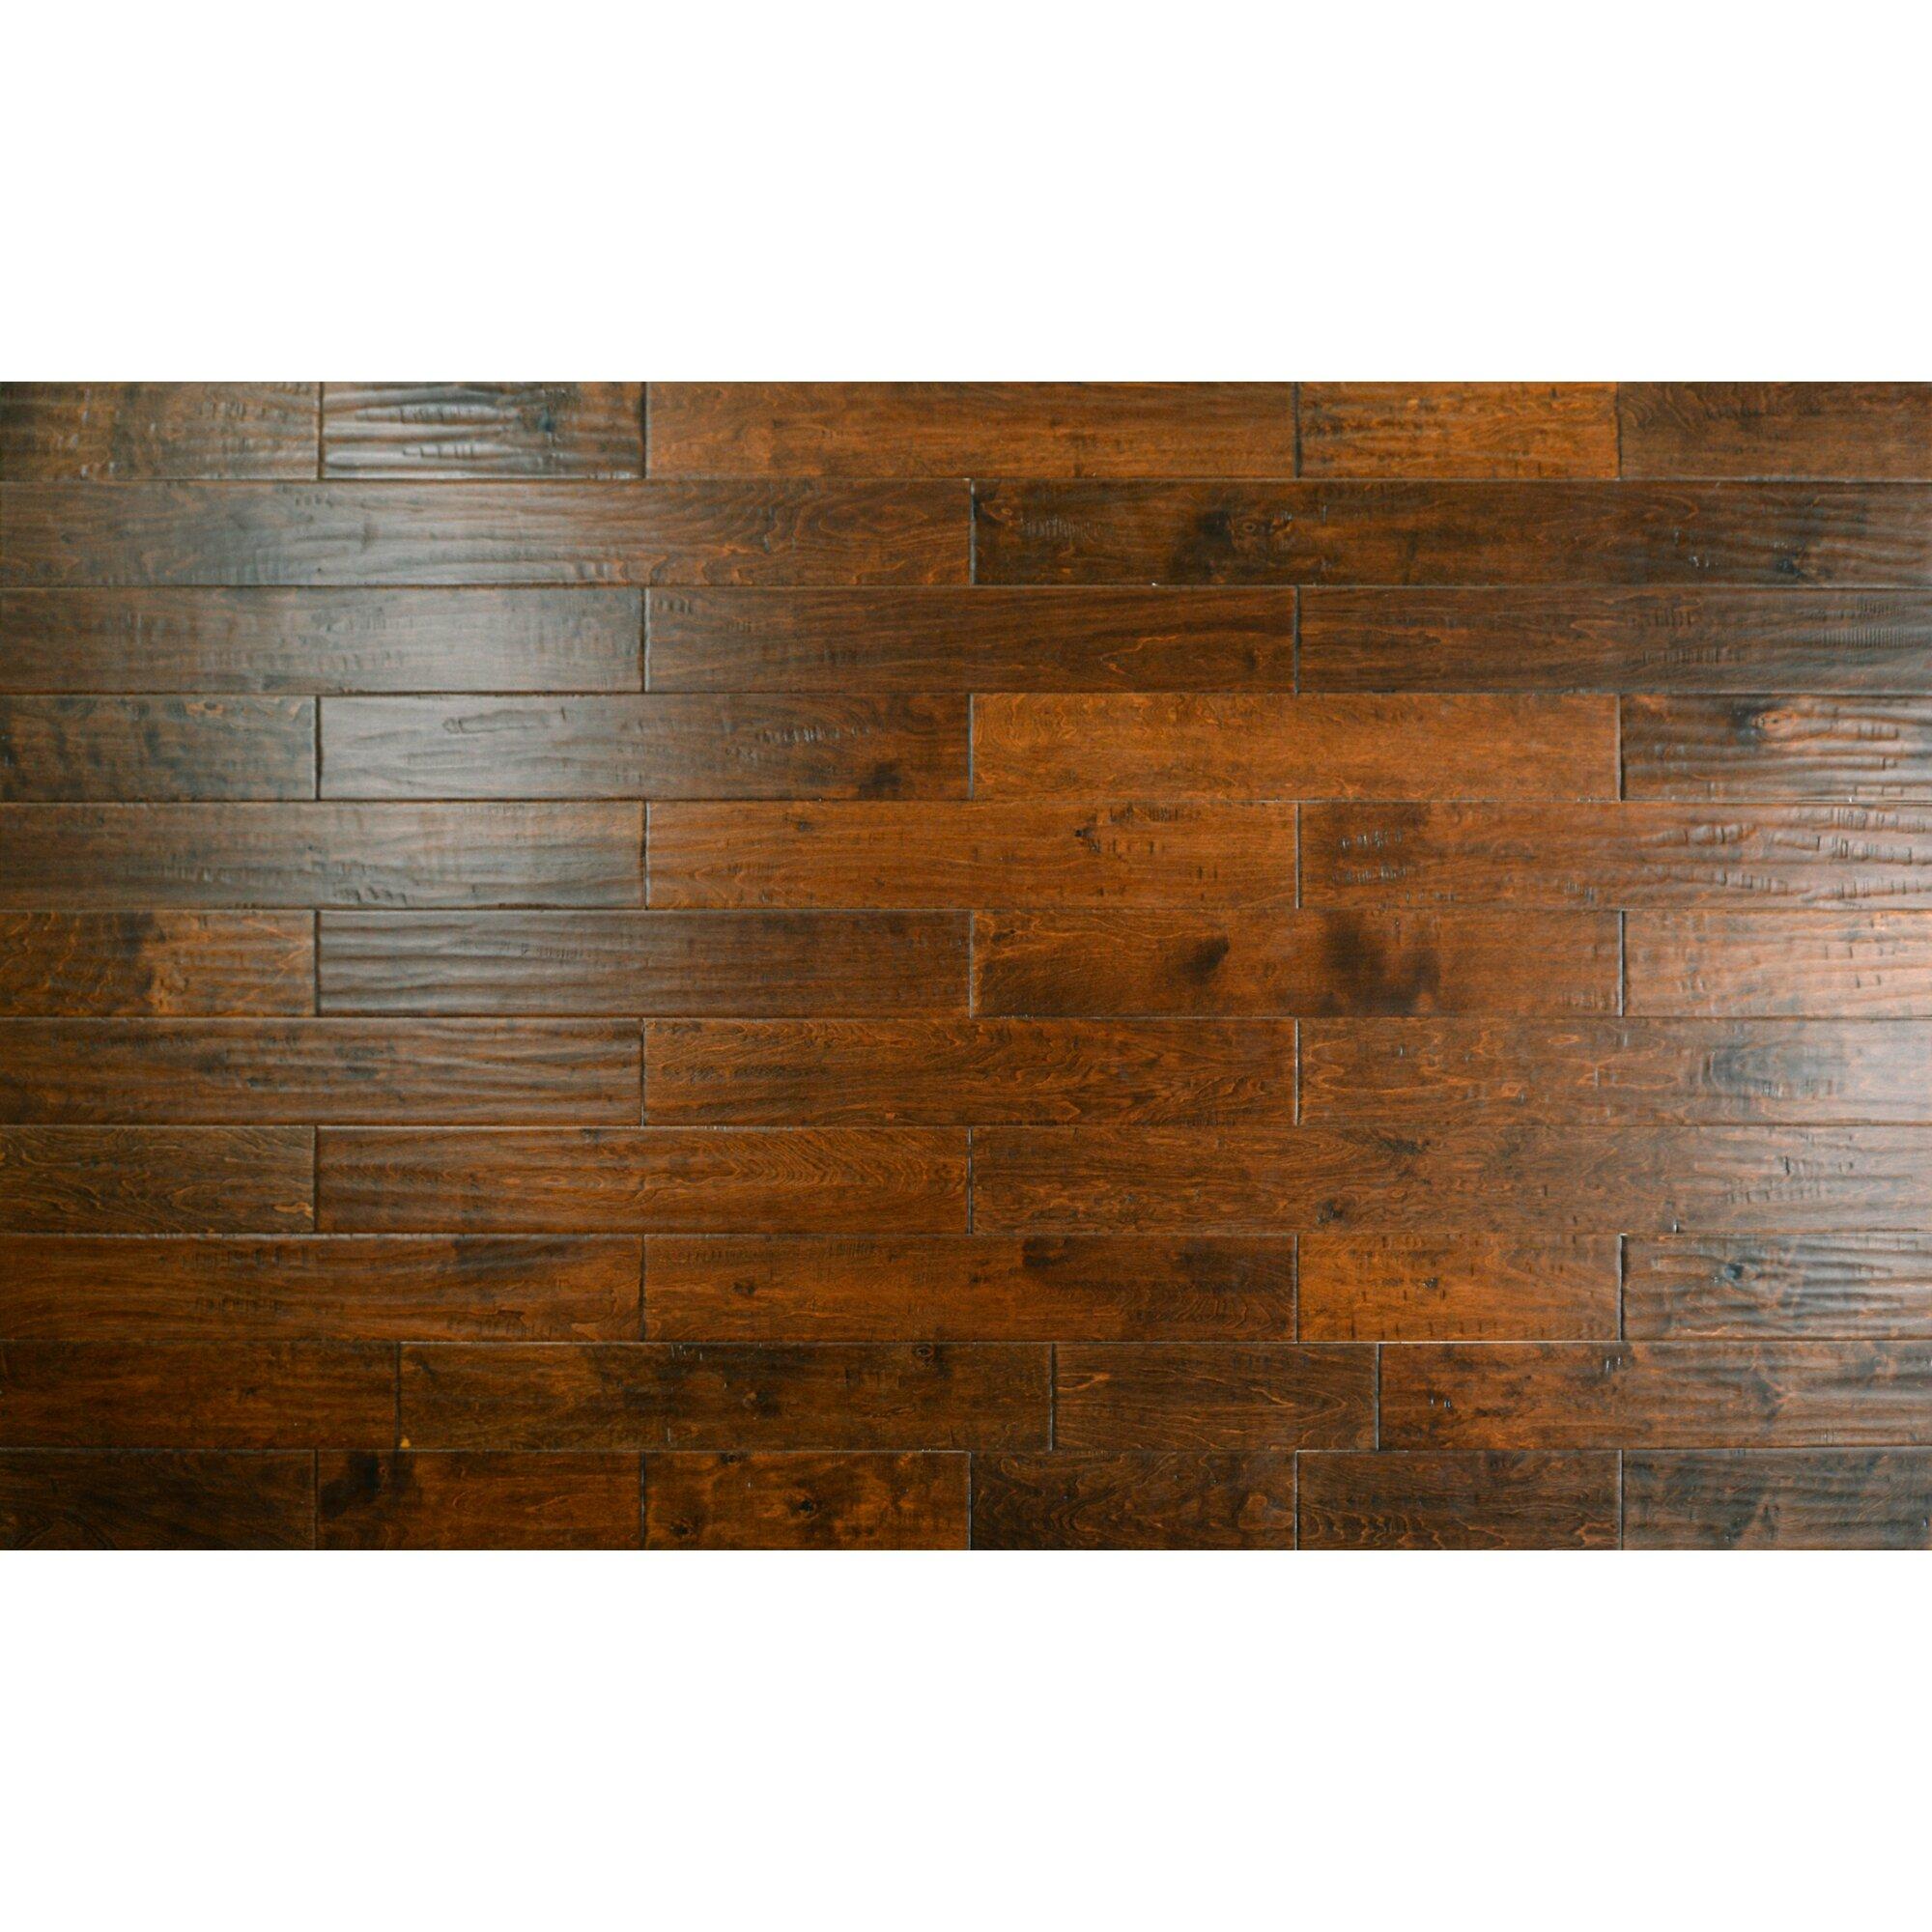 Birch Hardwood Flooring hand scraped chocolate birch 5 Pioneer 5 Engineered Birch Hardwood Flooring In Tomahawk